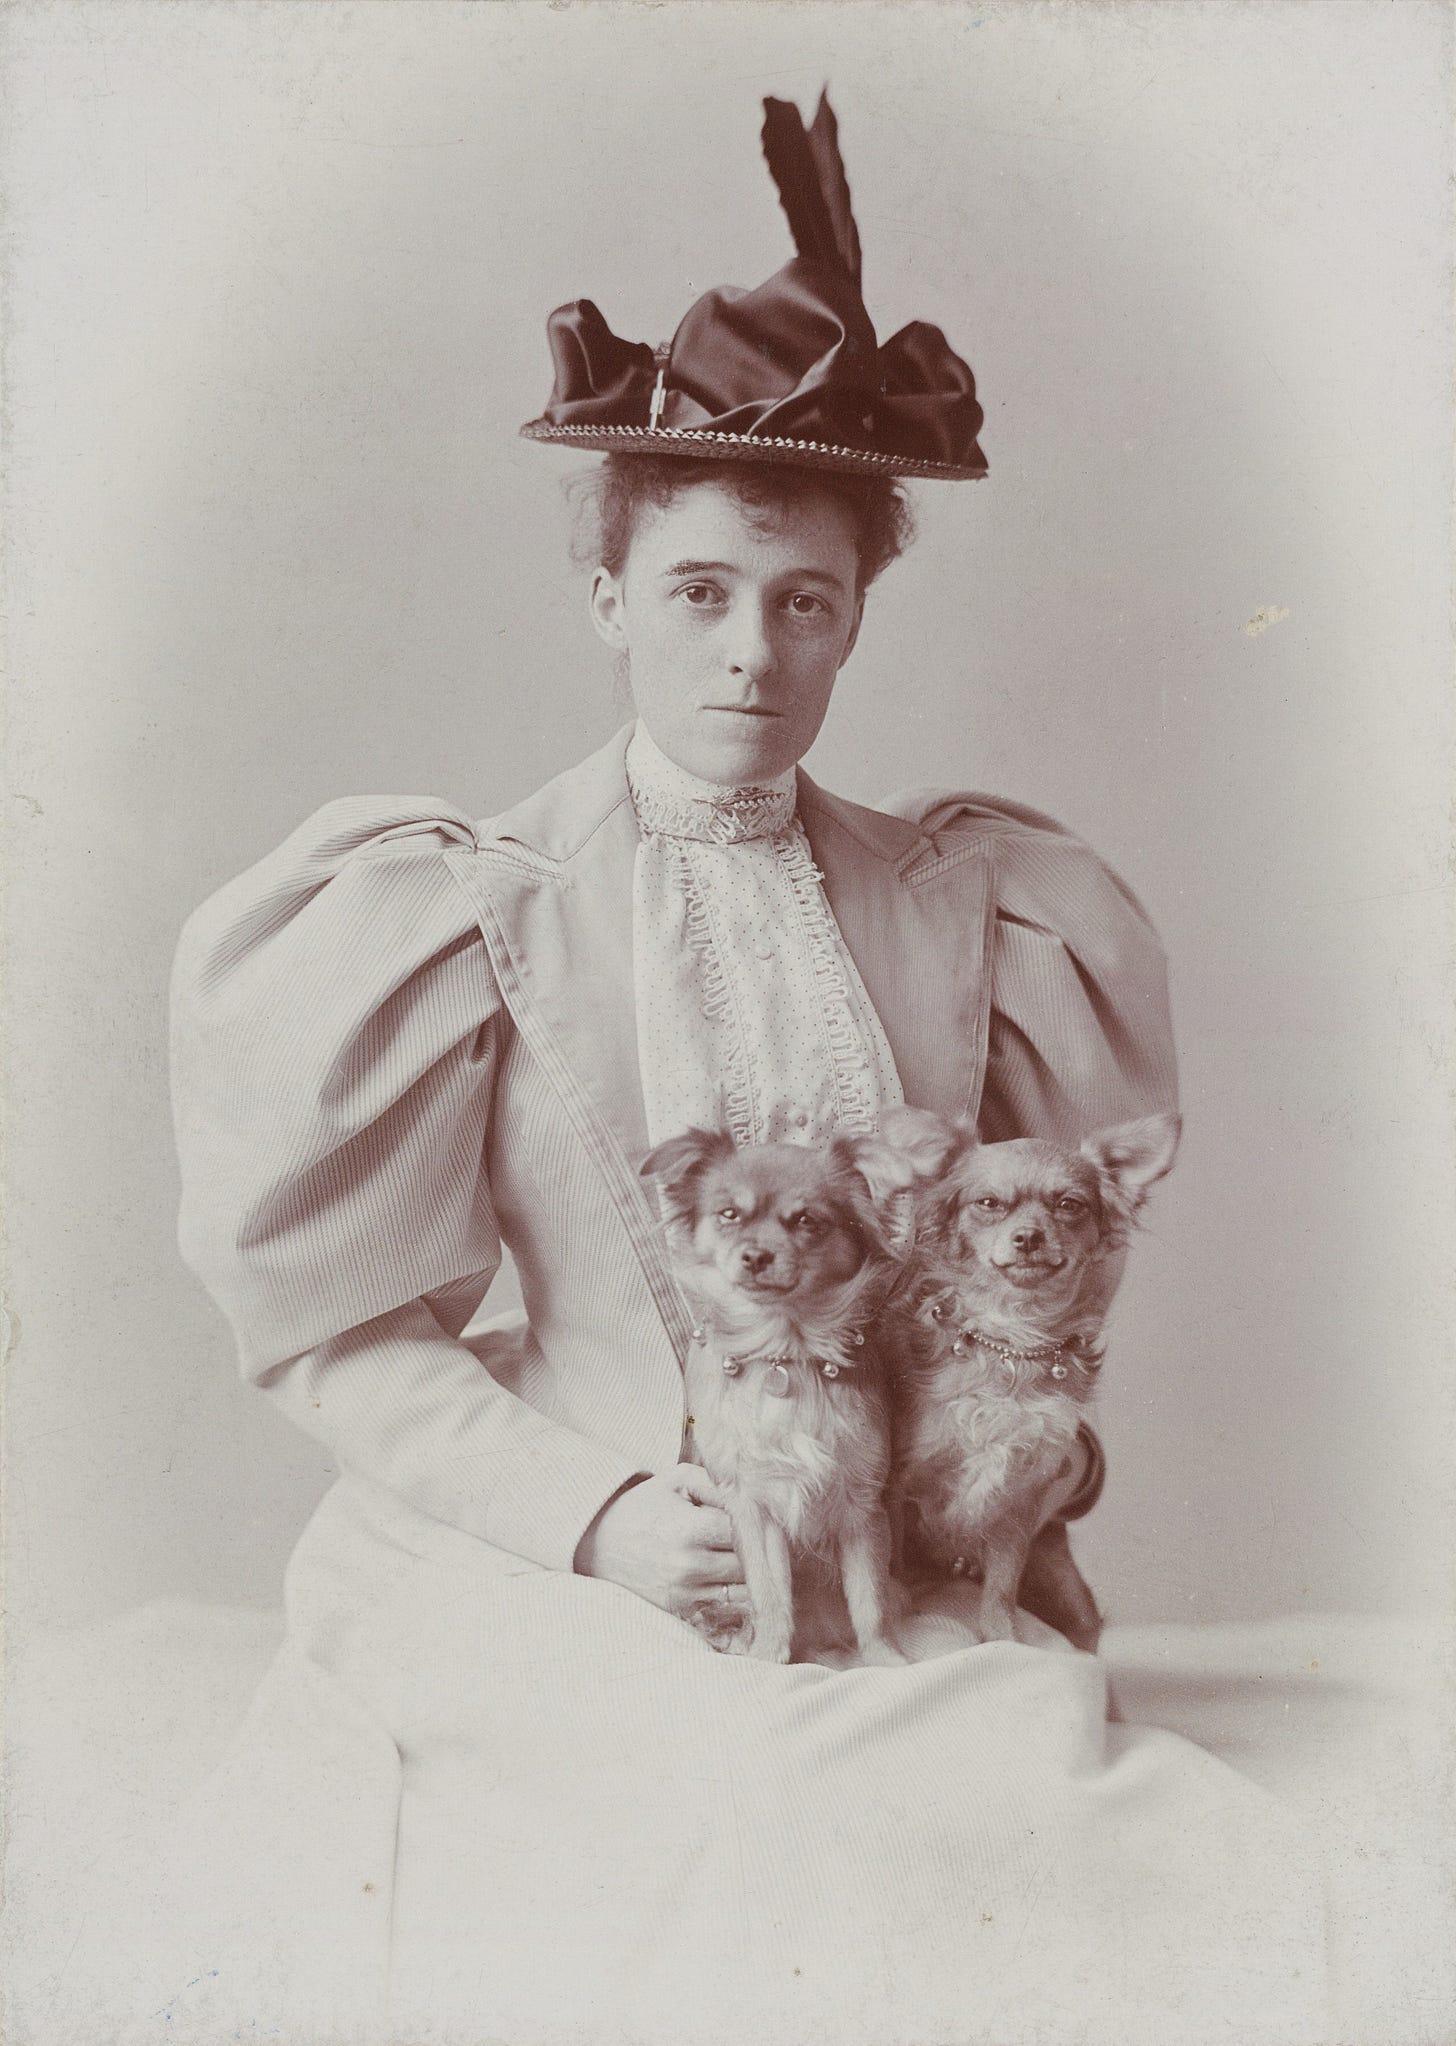 https://upload.wikimedia.org/wikipedia/commons/3/3a/Edith_Newbold_Jones_Wharton.jpg